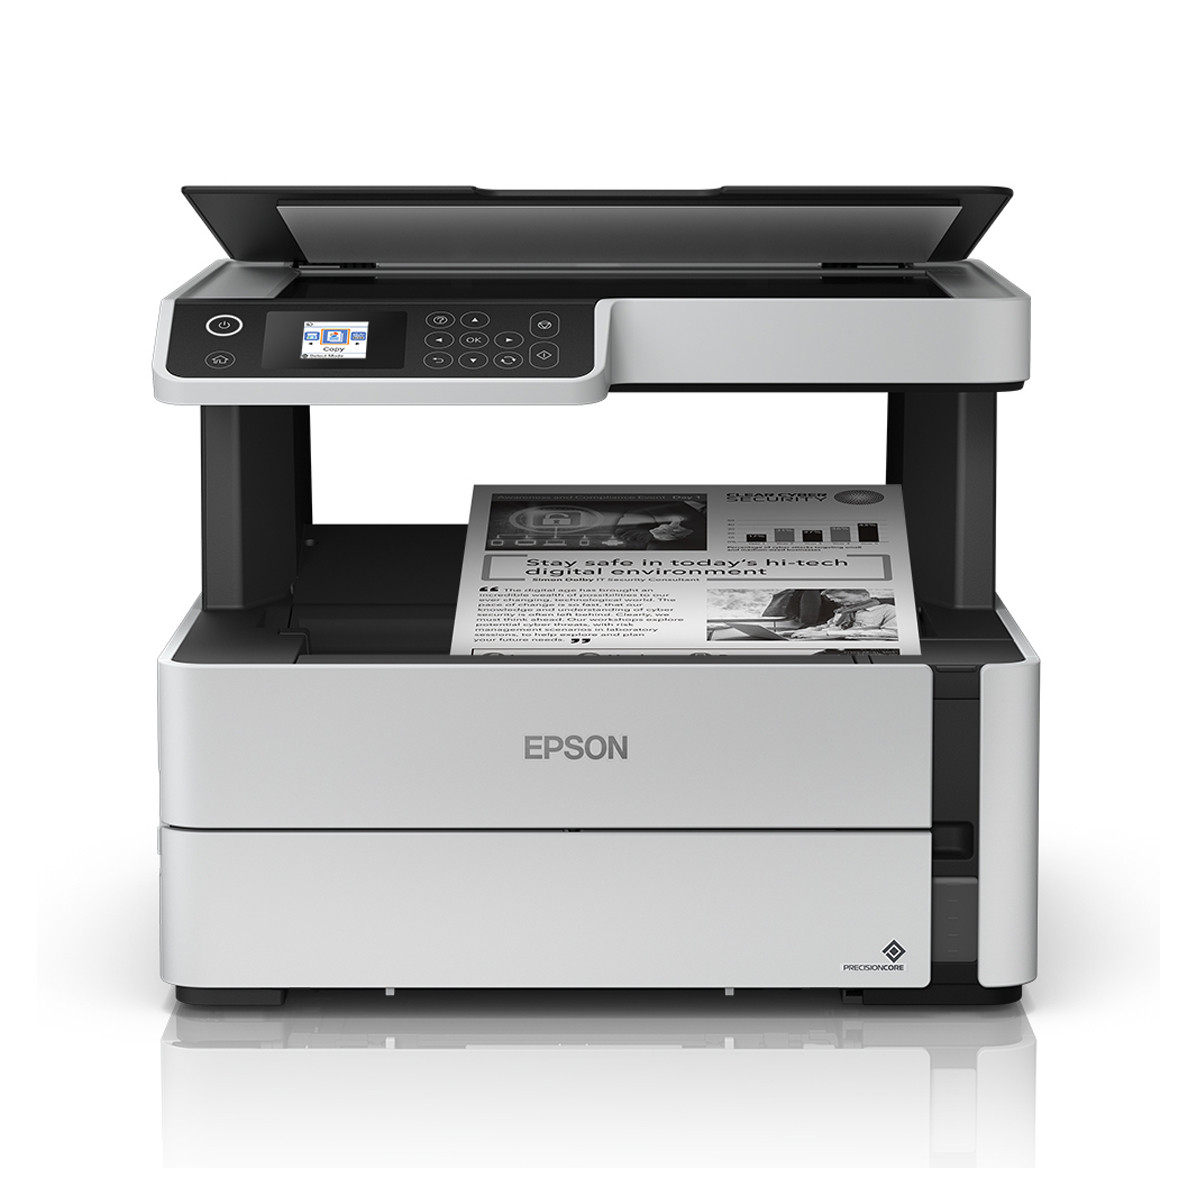 Impressora Epson M2170 EcoTank Multifuncional com Wireless e Duplex